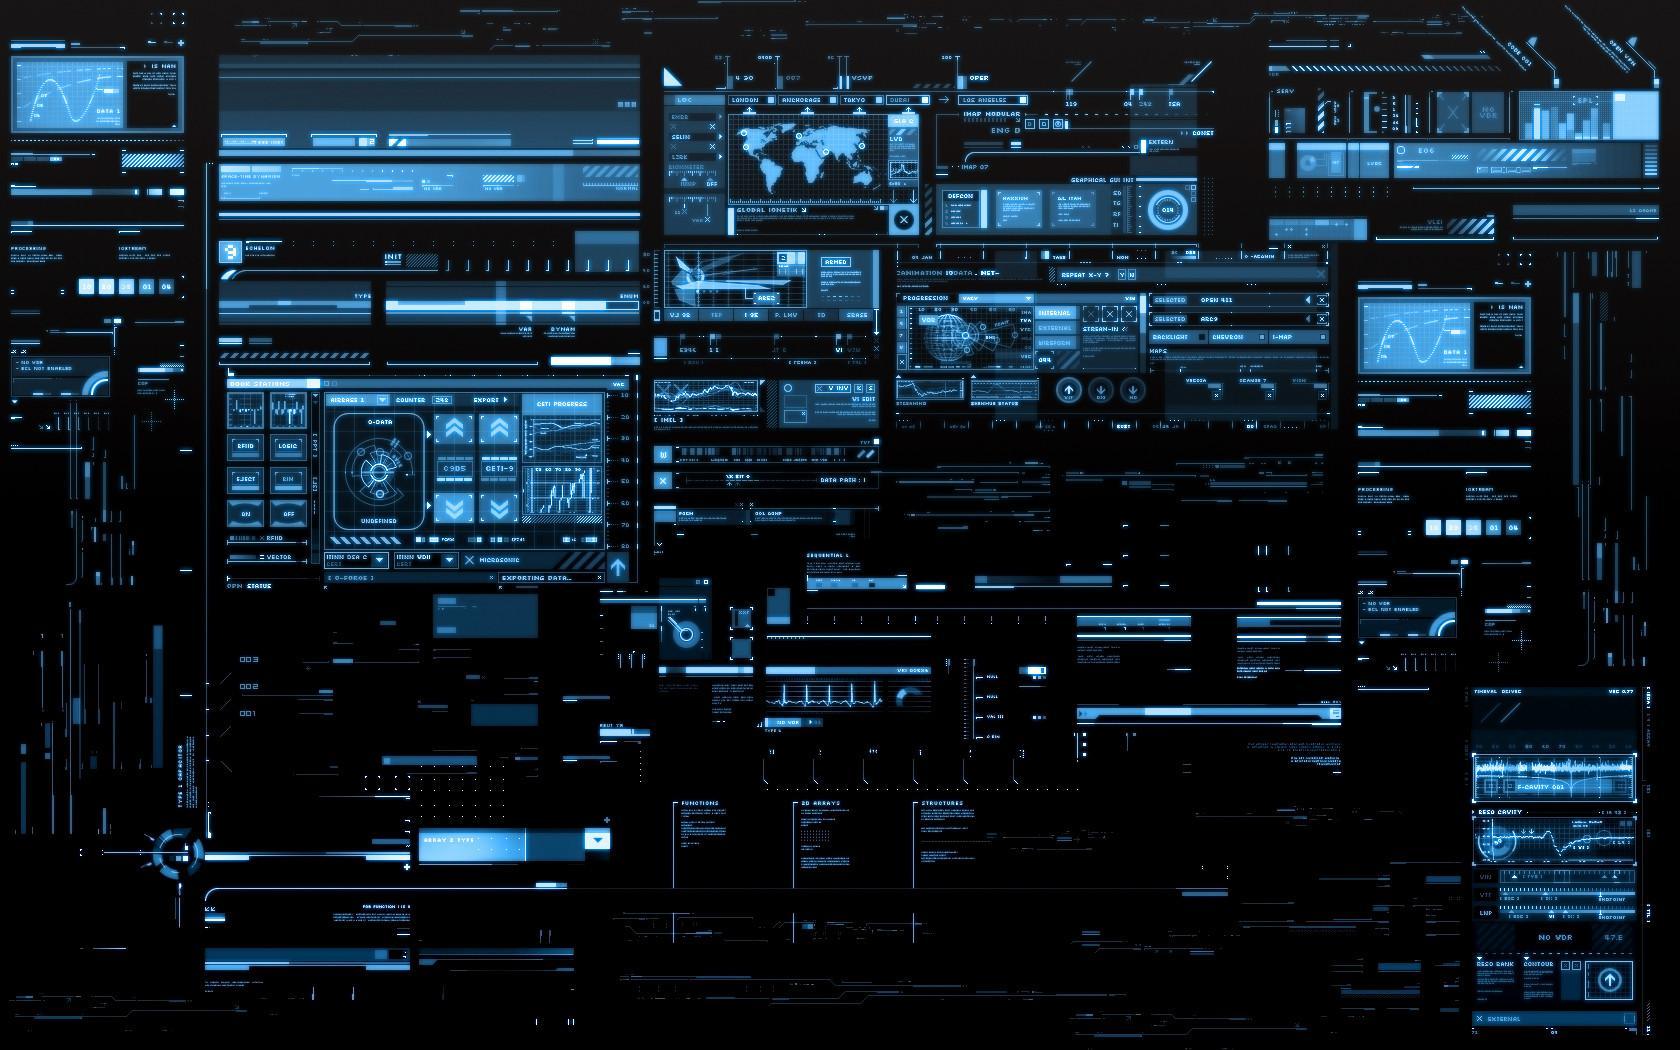 Wallpapers For High Tech Windows Wallpaper wallpaper uploaded on 1680x1050